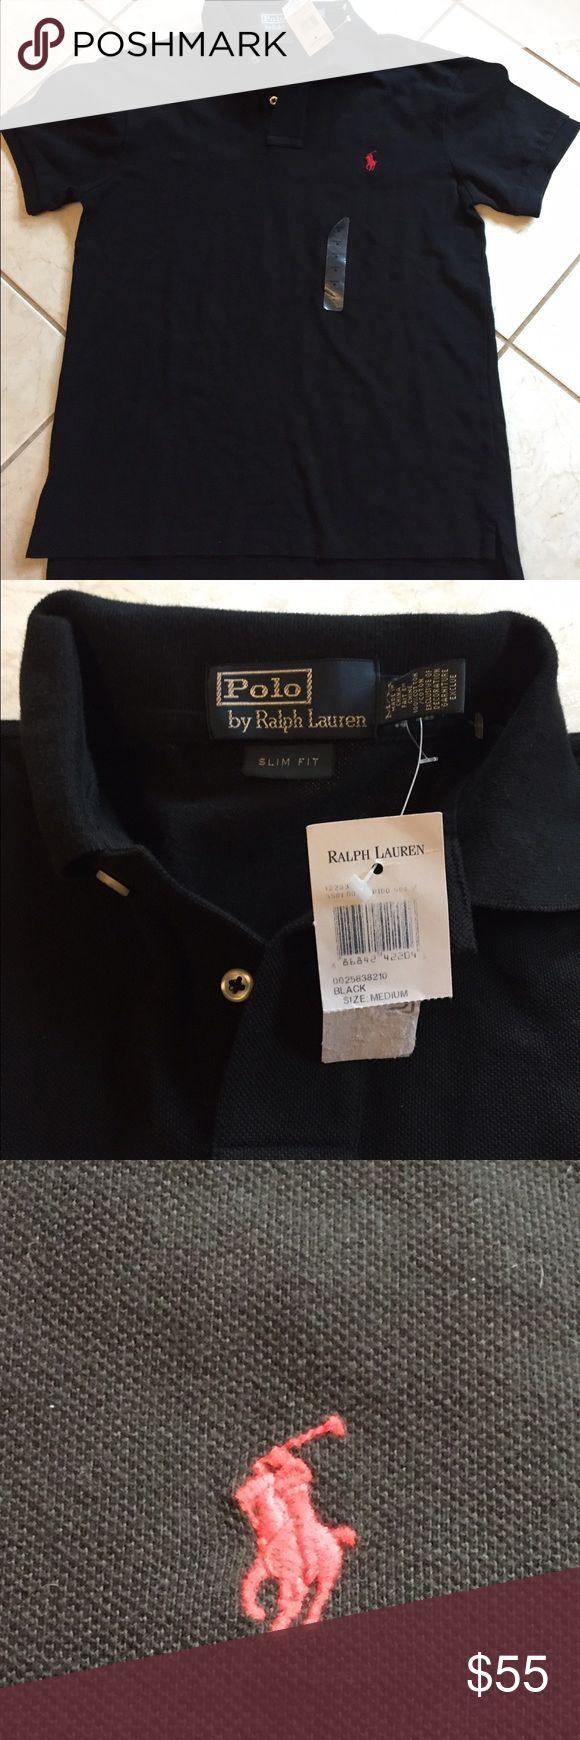 New slim fit men's black polo shirt sz M Polo by Ralph Lauren sz Medium slim fit.  Short sleeve. NWT Polo by Ralph Lauren Shirts Polos